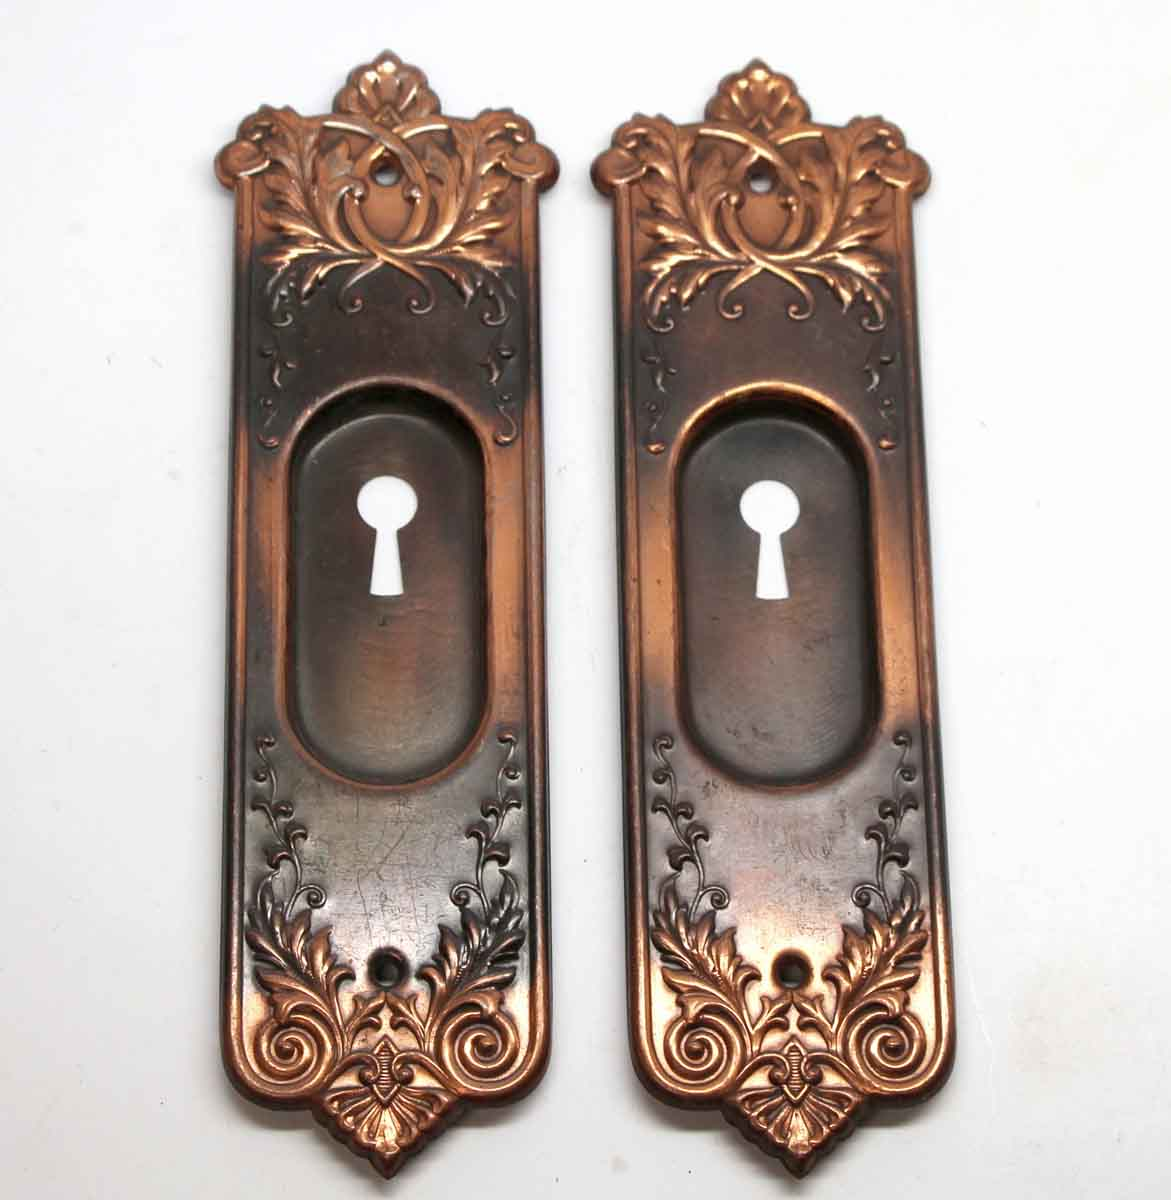 Bon Pocket Door Hardware   Ornate Copper U0026 Black Finish Steel Pocket Door Plates